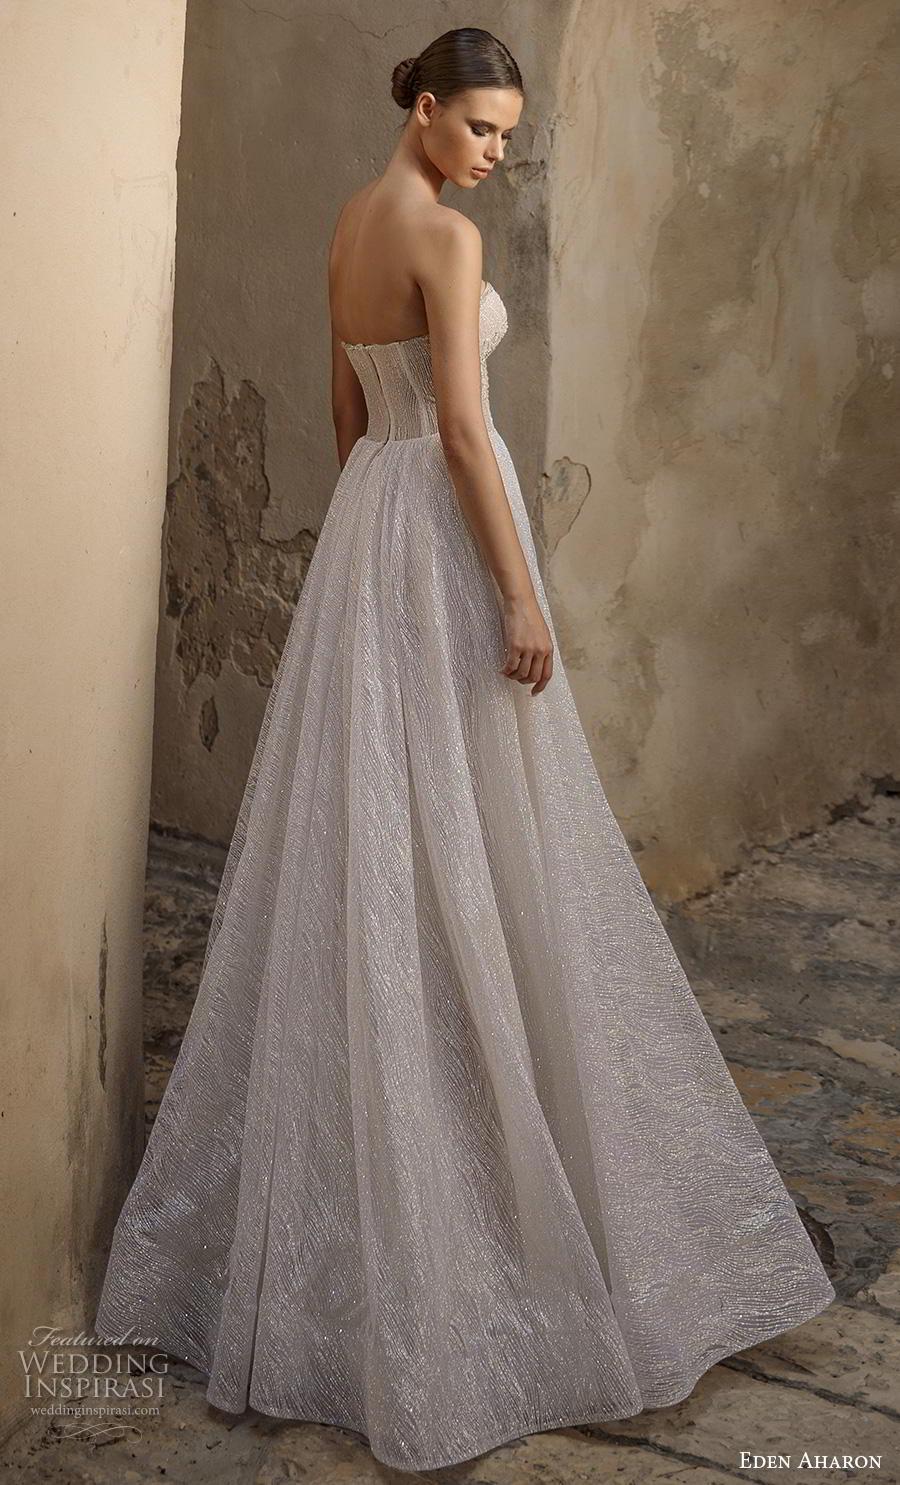 eden aharon 2019 bridal strapless sweetheart neckline heavily embellished bodice glitzy romantic a  line wedding dress mid back sweep train (8) bv